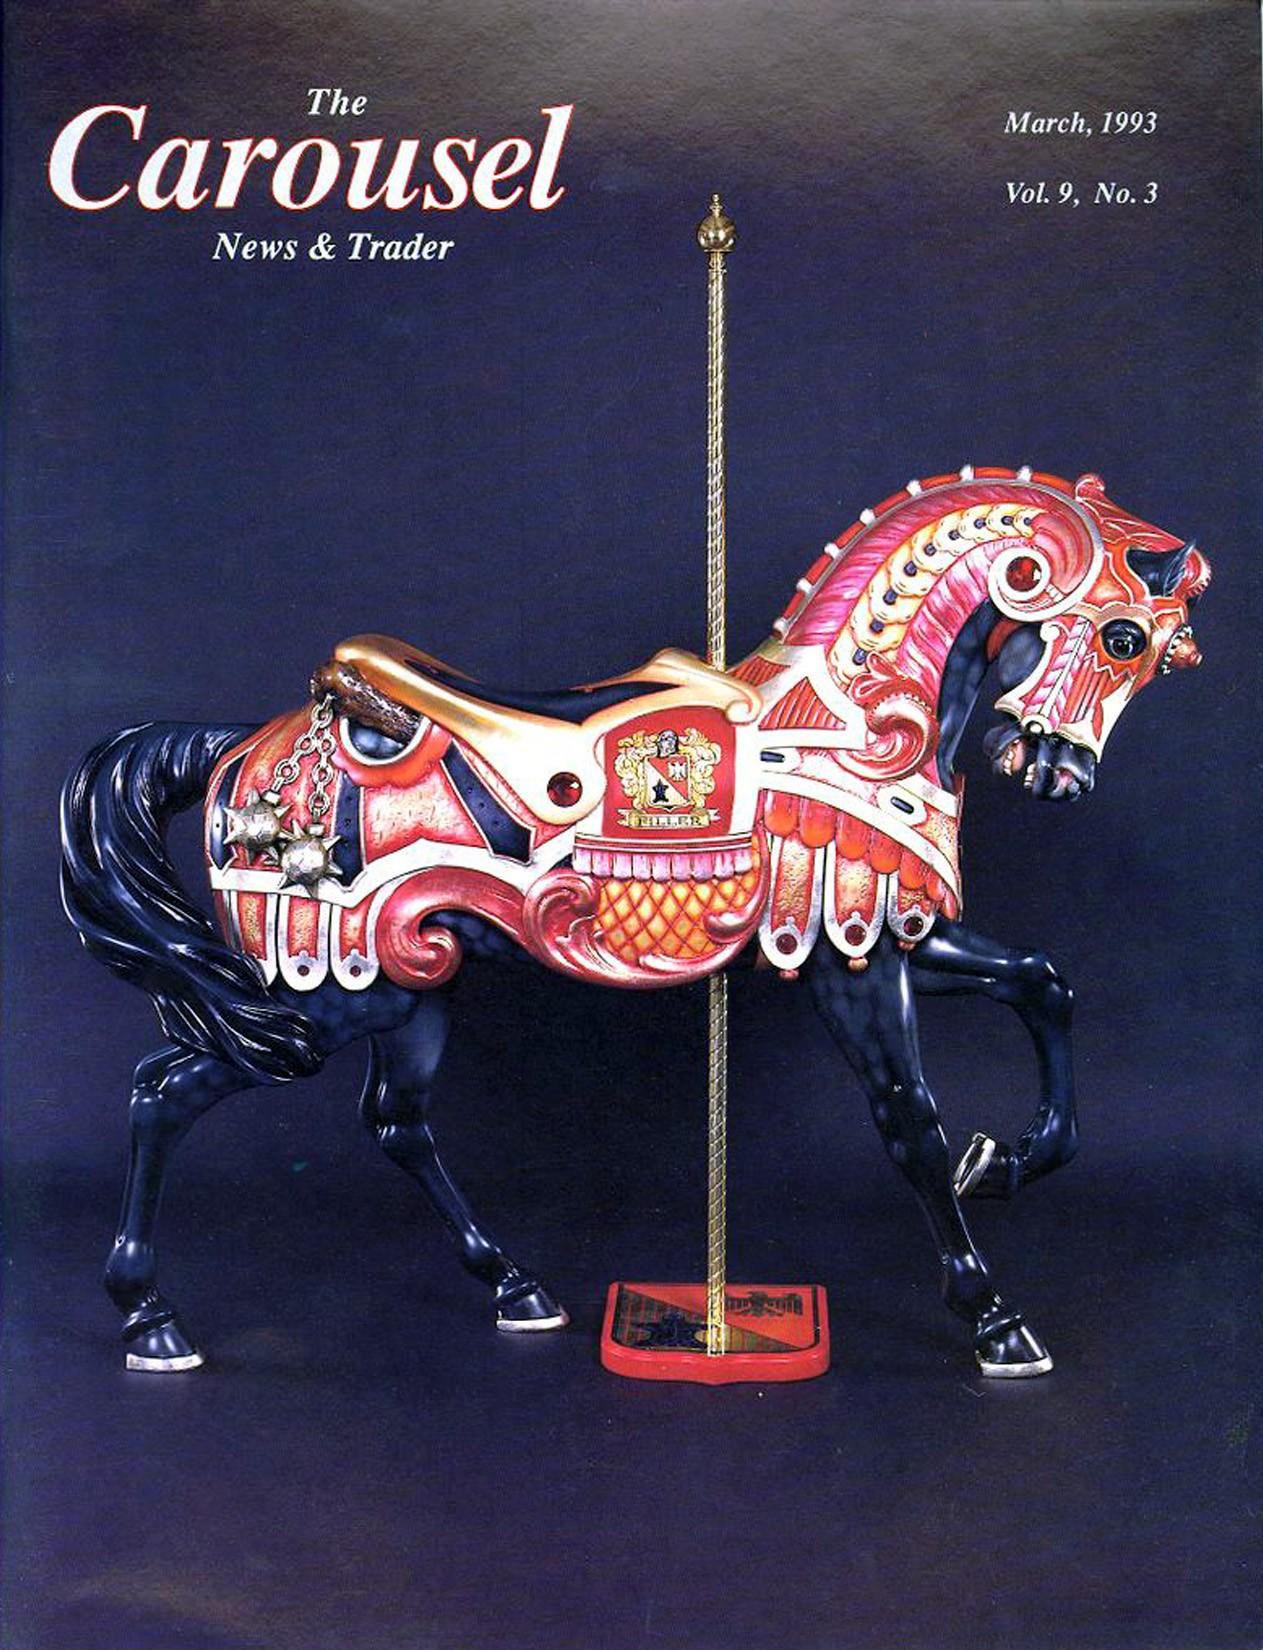 cnt_03_1993-PTC-59-carousel-Petticoat-armored-horse